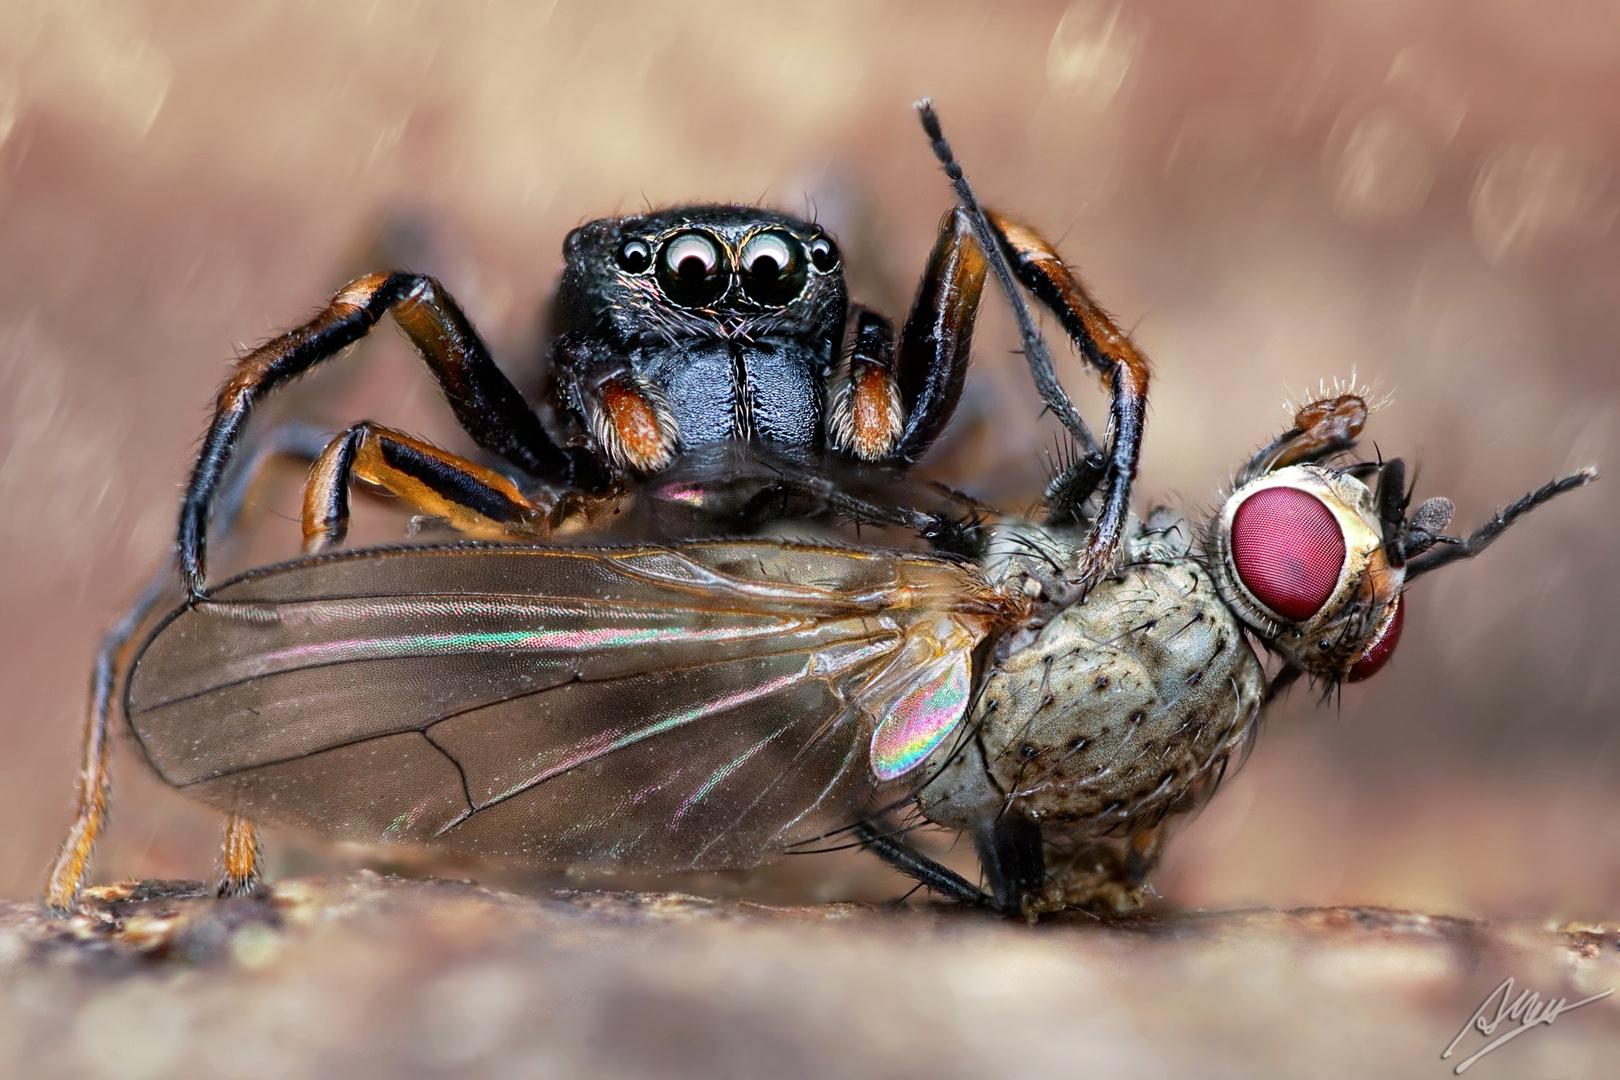 Ameisenspringspinne mit Beute